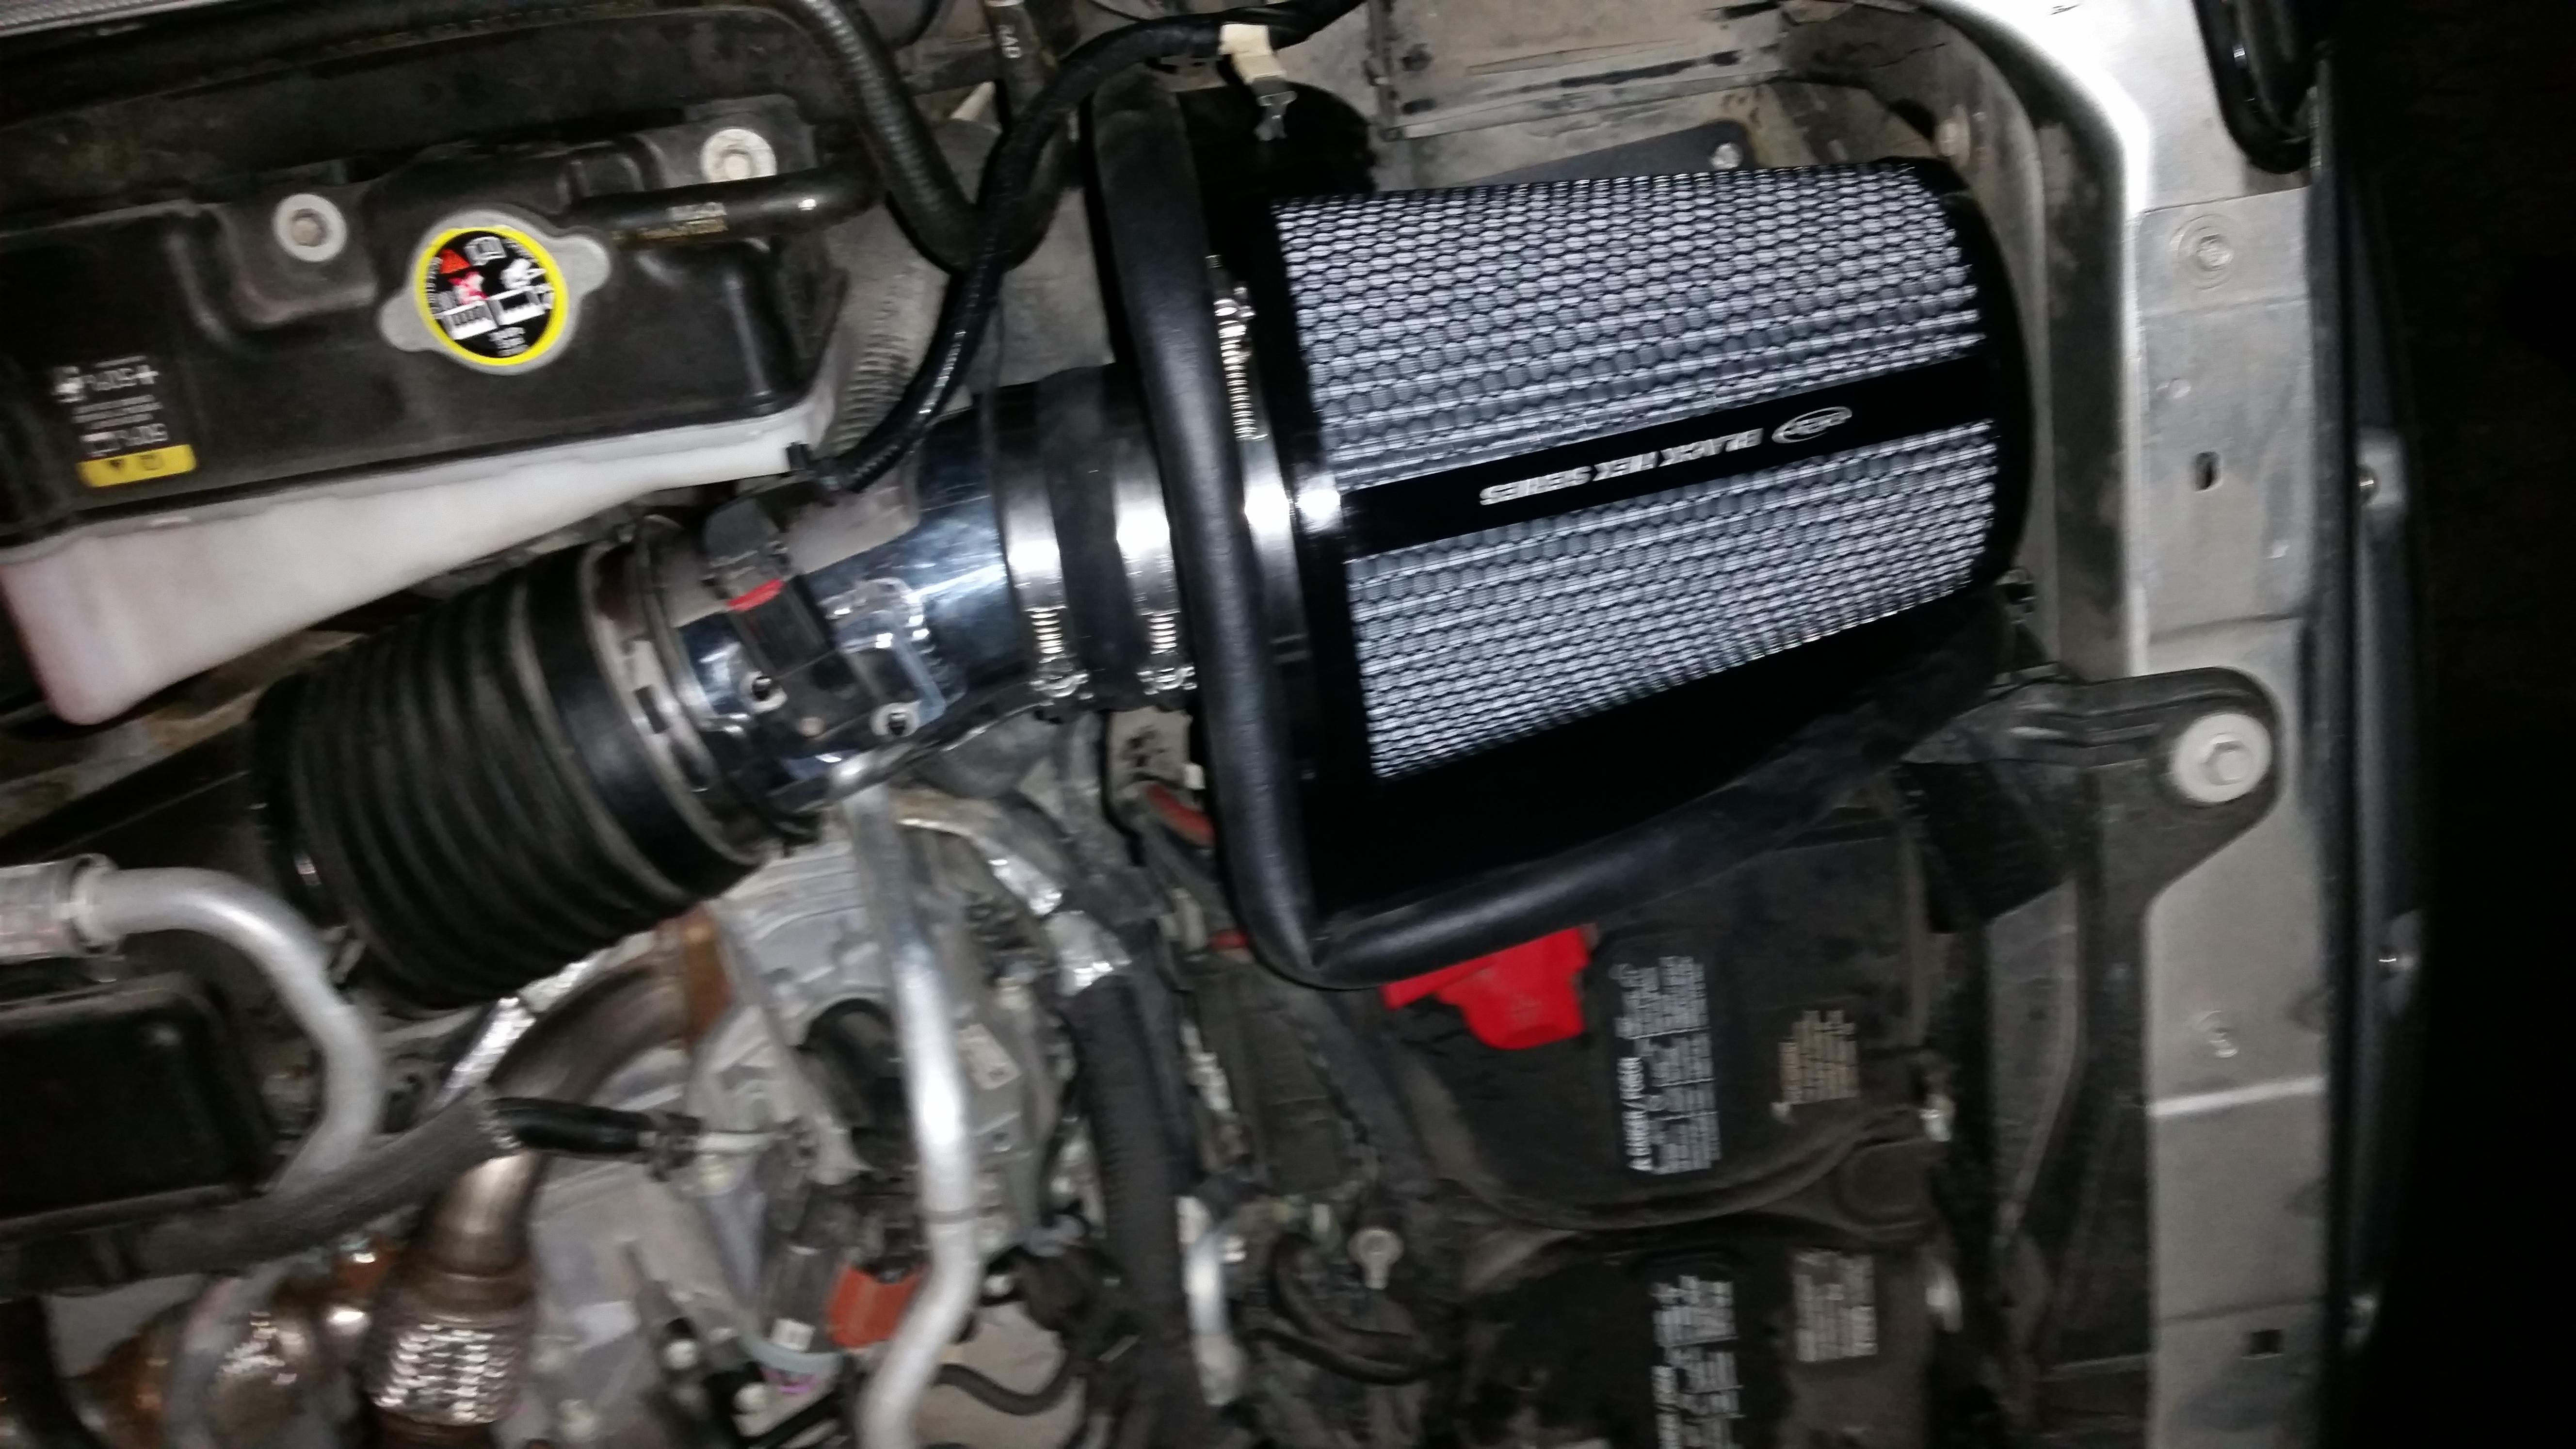 Best Cold Air Intake Page 2 Ford Powerstroke Diesel Forum